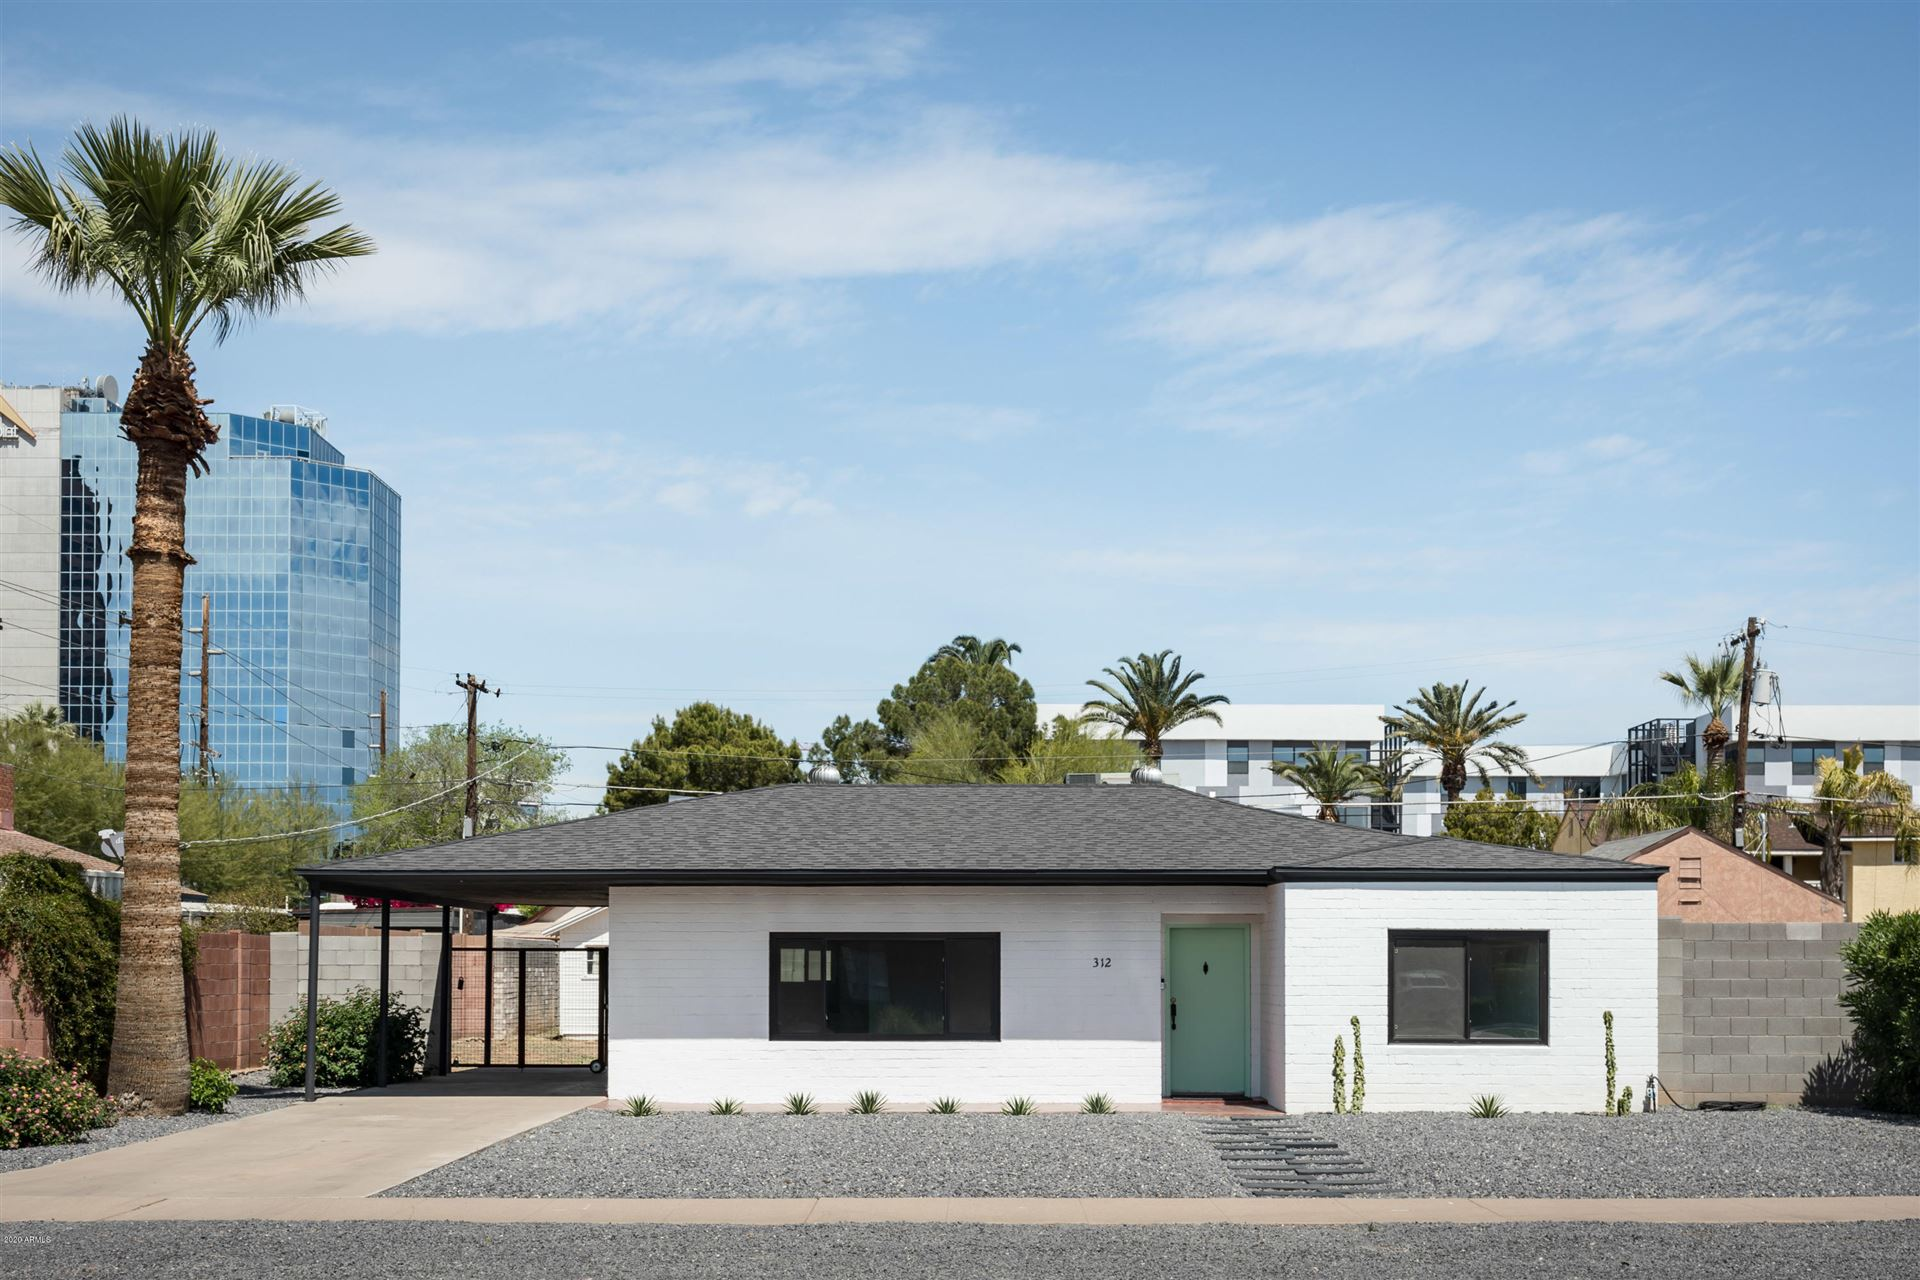 Property Image Of 312 E Verde Lane In Phoenix, Az